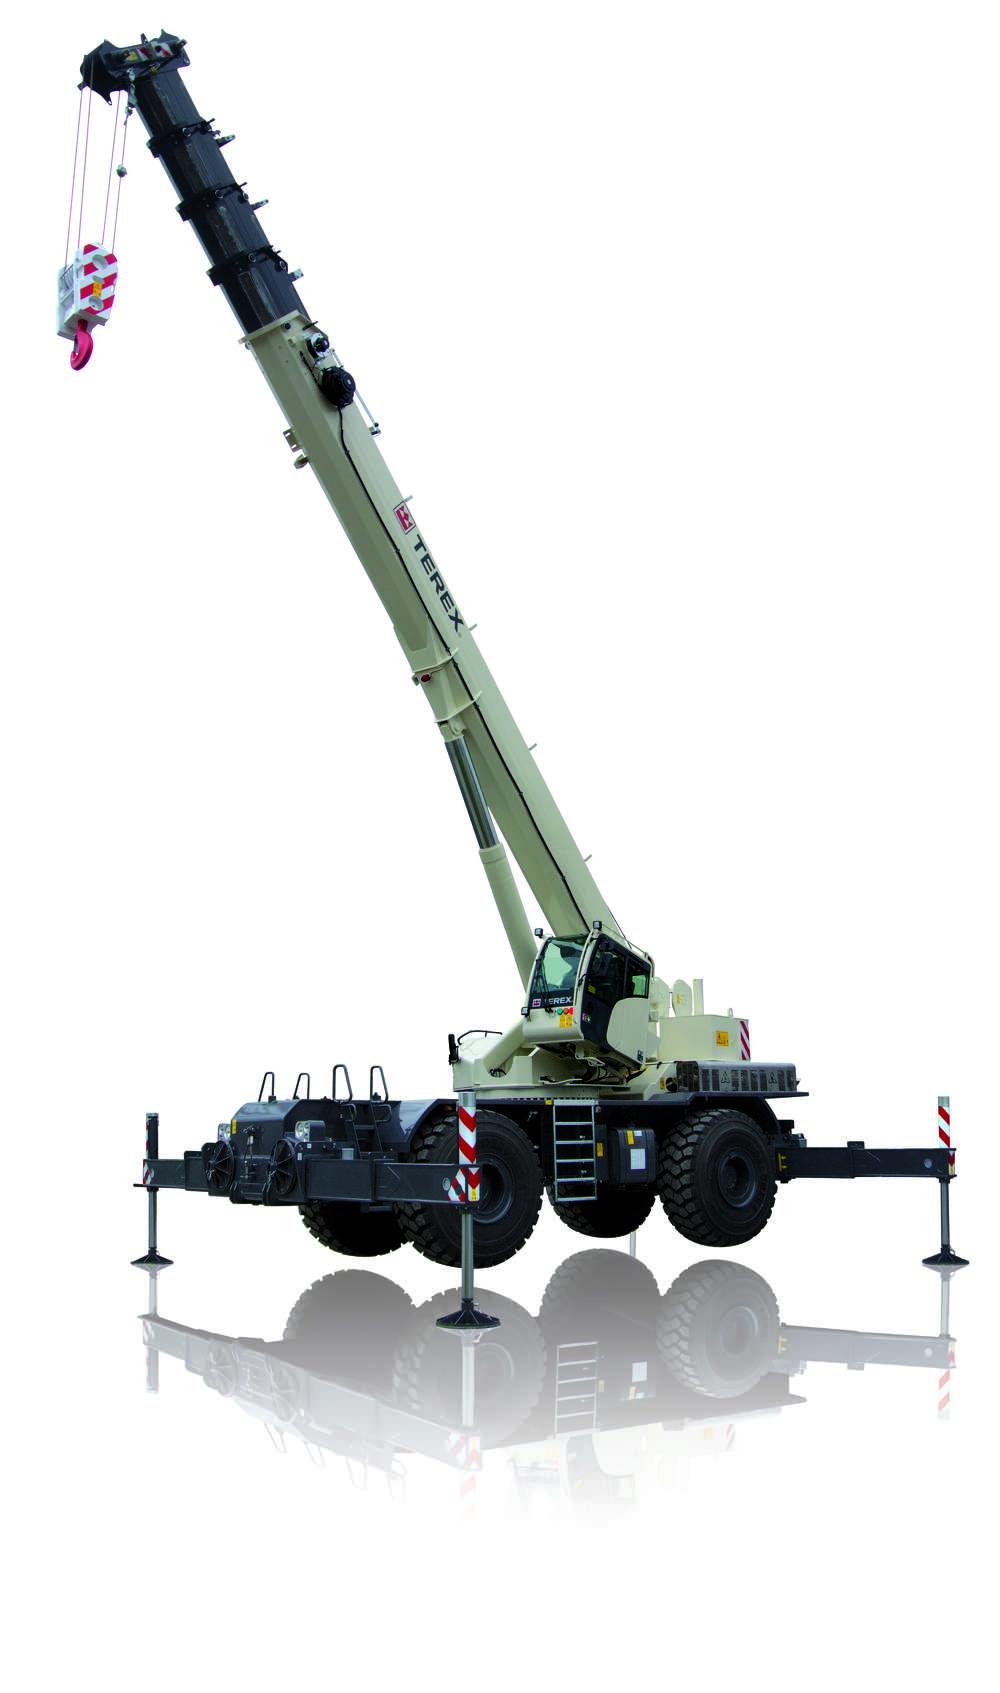 Parts Of A Rough Terrain Crane : Terex introduces new rt us rough terrain crane story